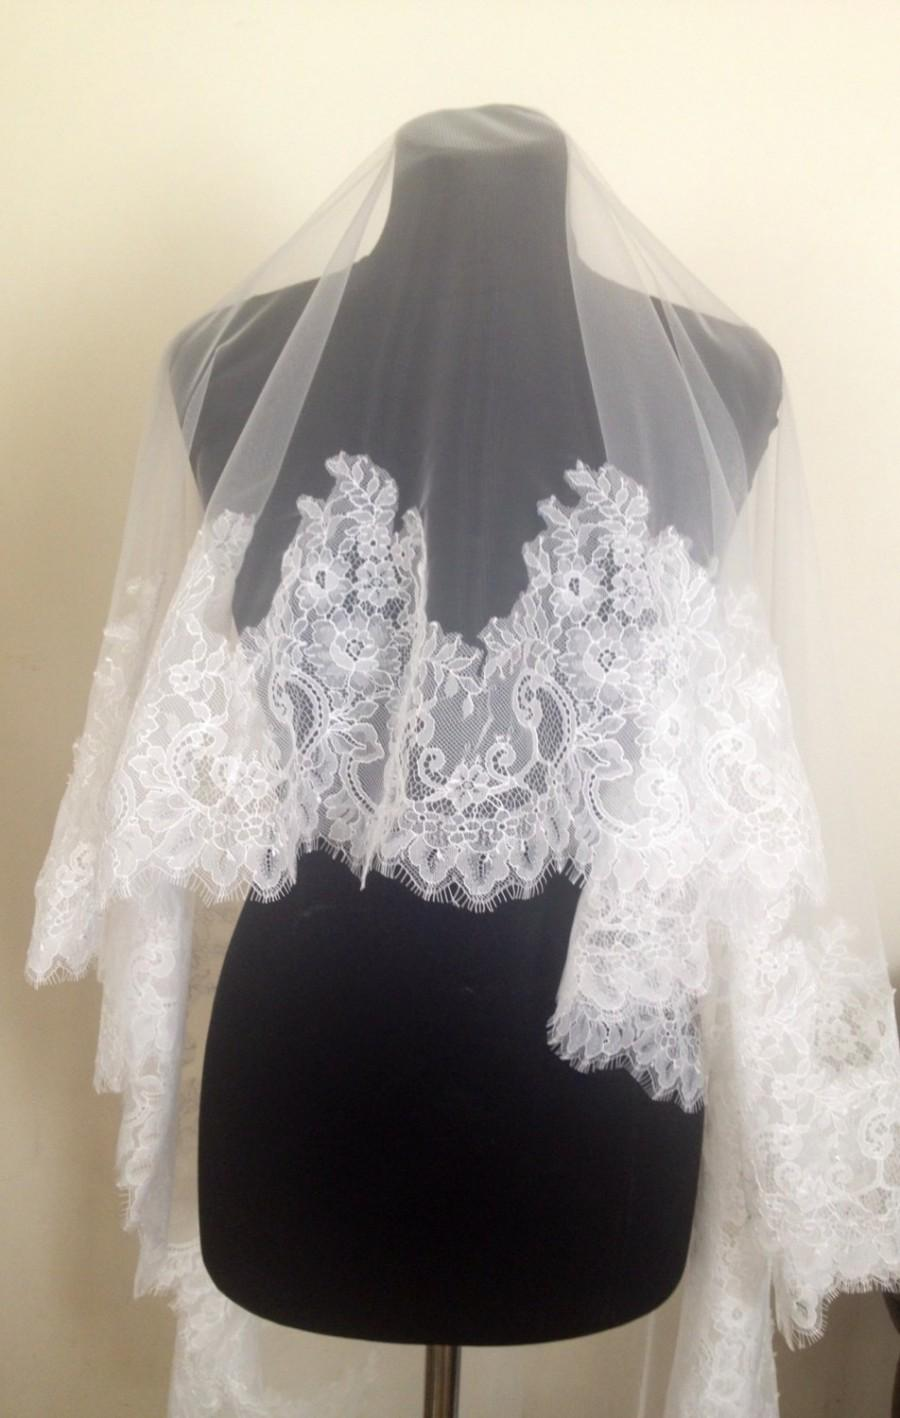 Hochzeit - NEW 2016 Royal Chantilly  lace veil. Bridal white veil, ivory veil. Cathedral headpiece.